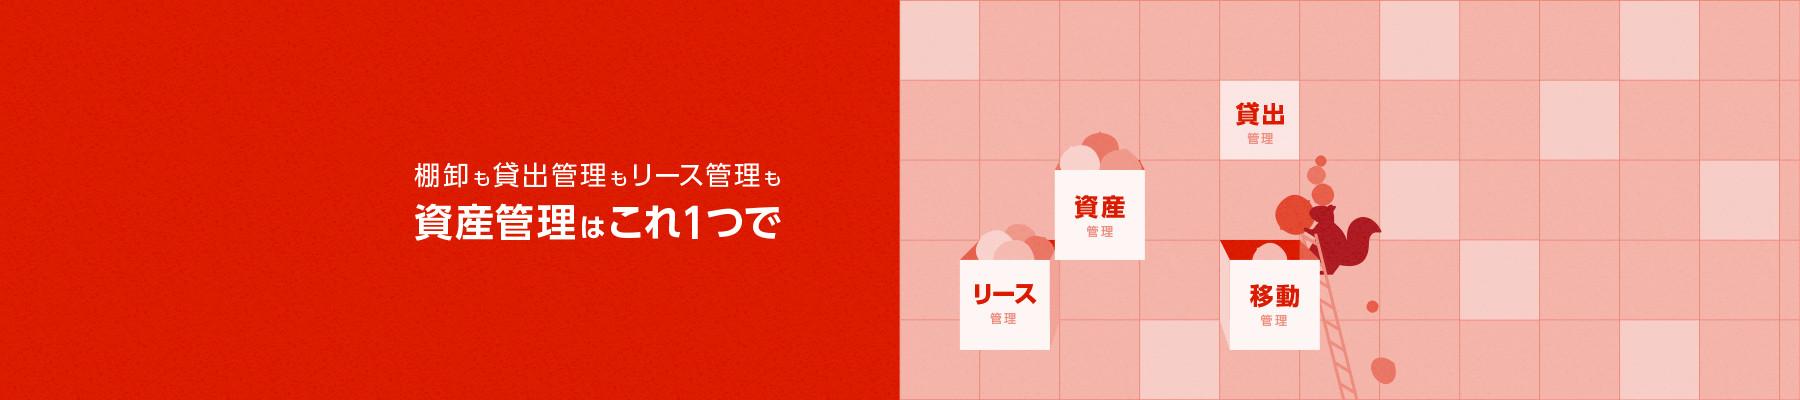 mv_02_pc.jpg